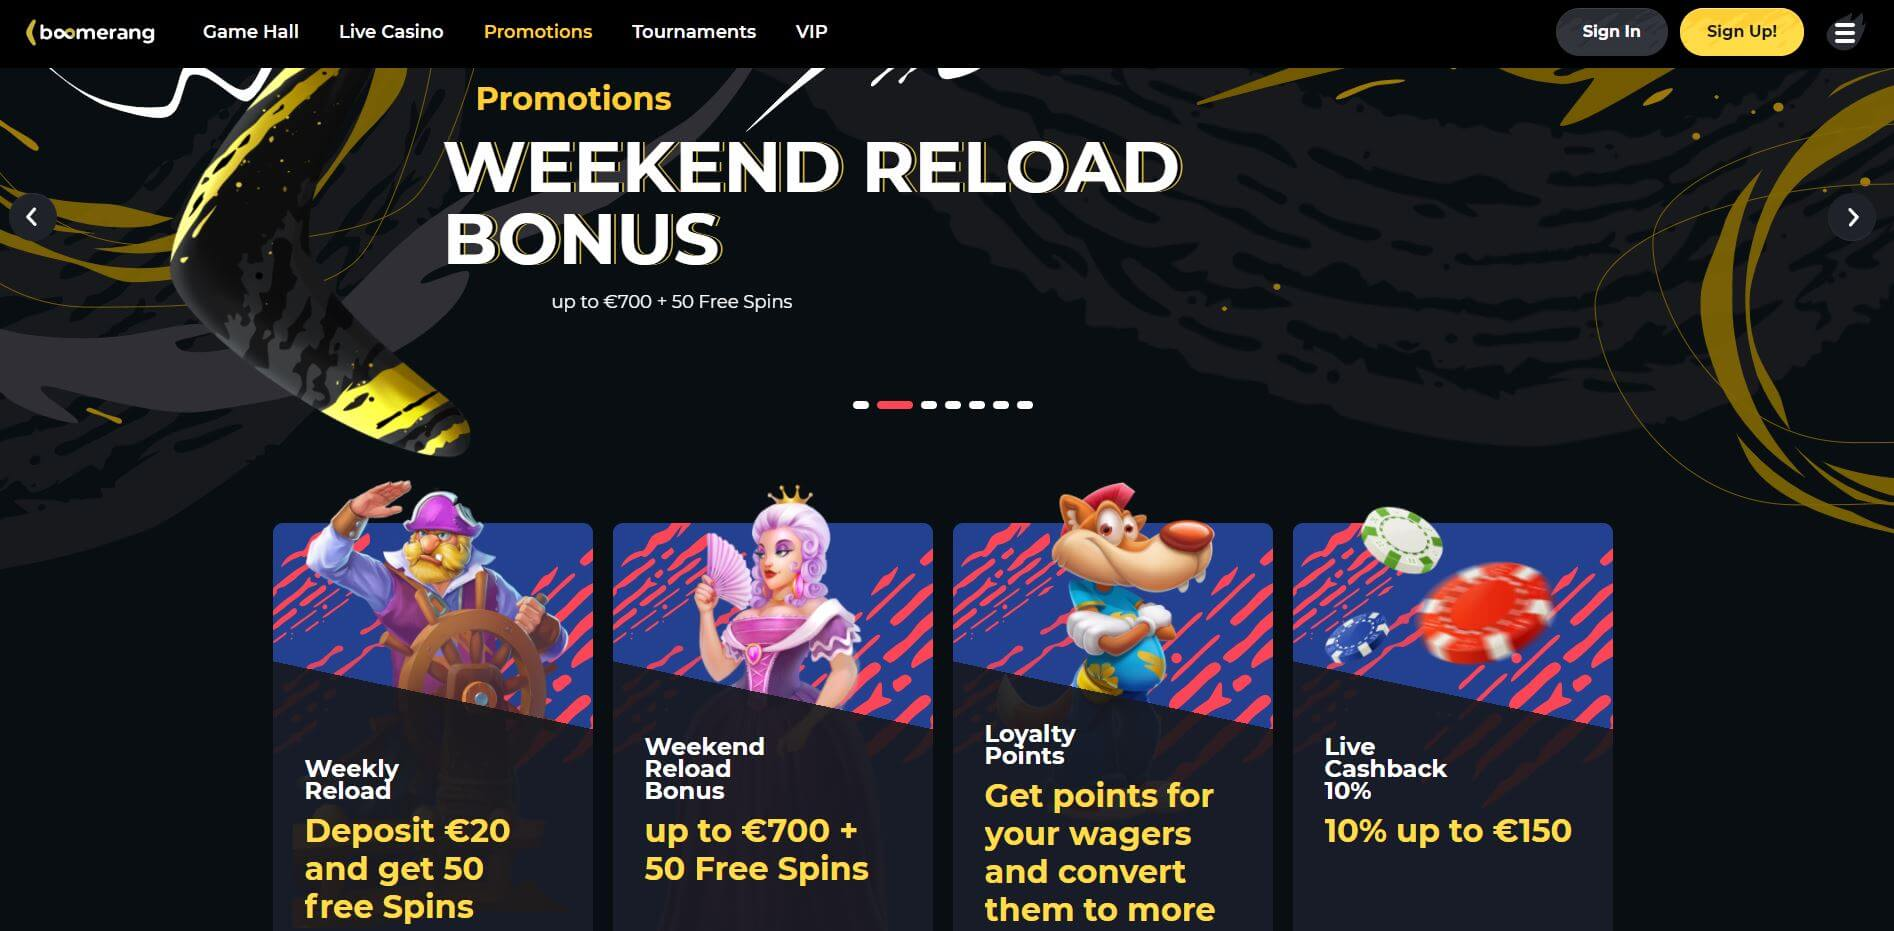 Boomerang Casino Promotions